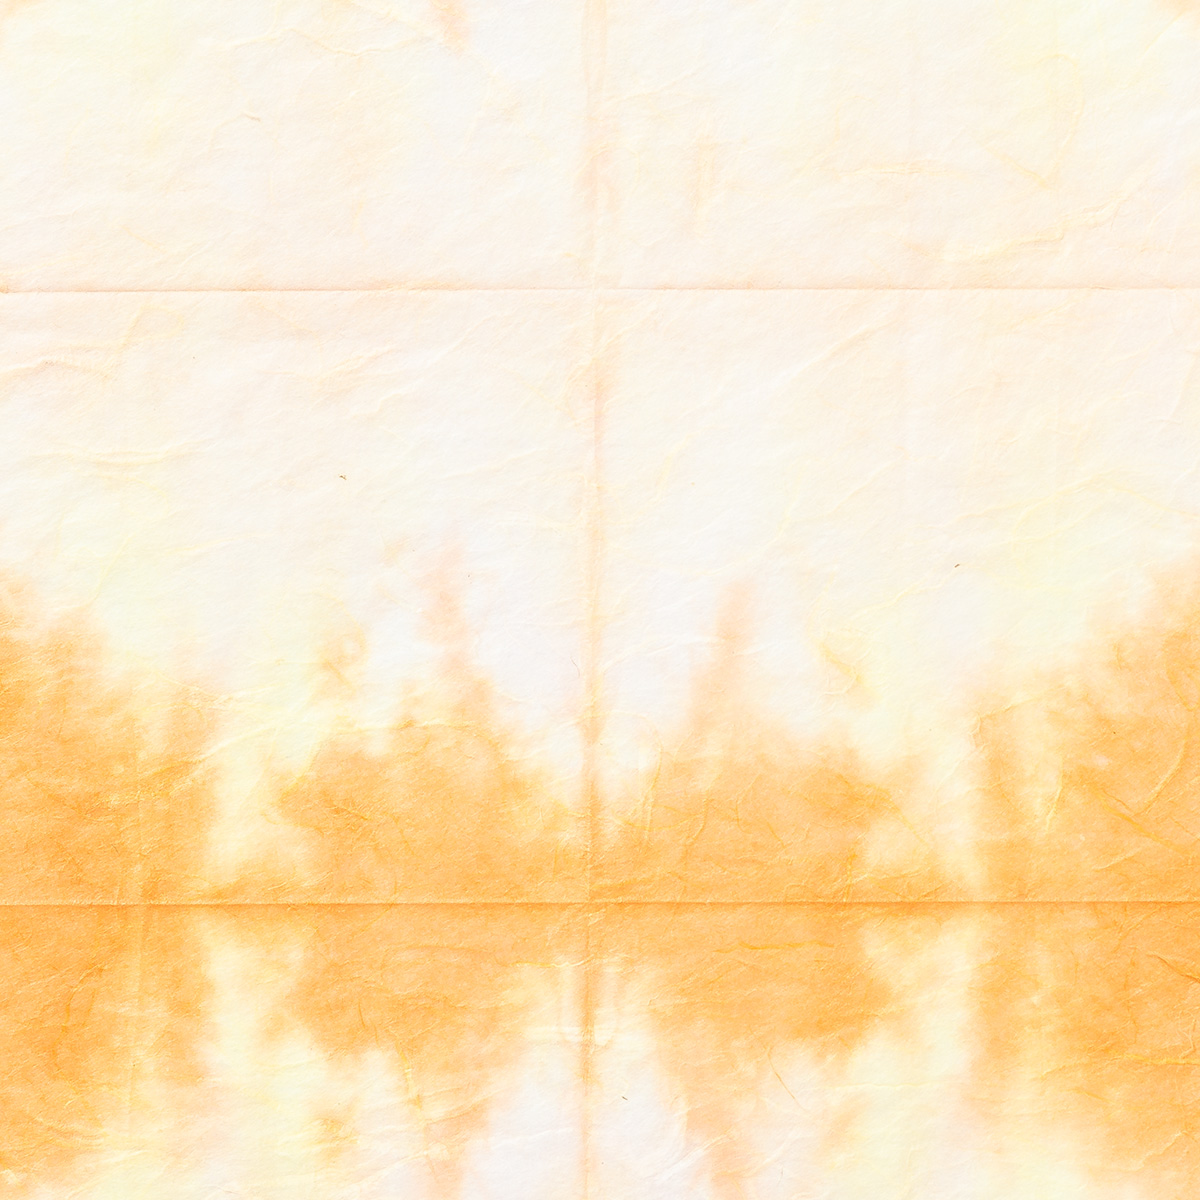 楮6匁 雲竜紙 板締め No.10